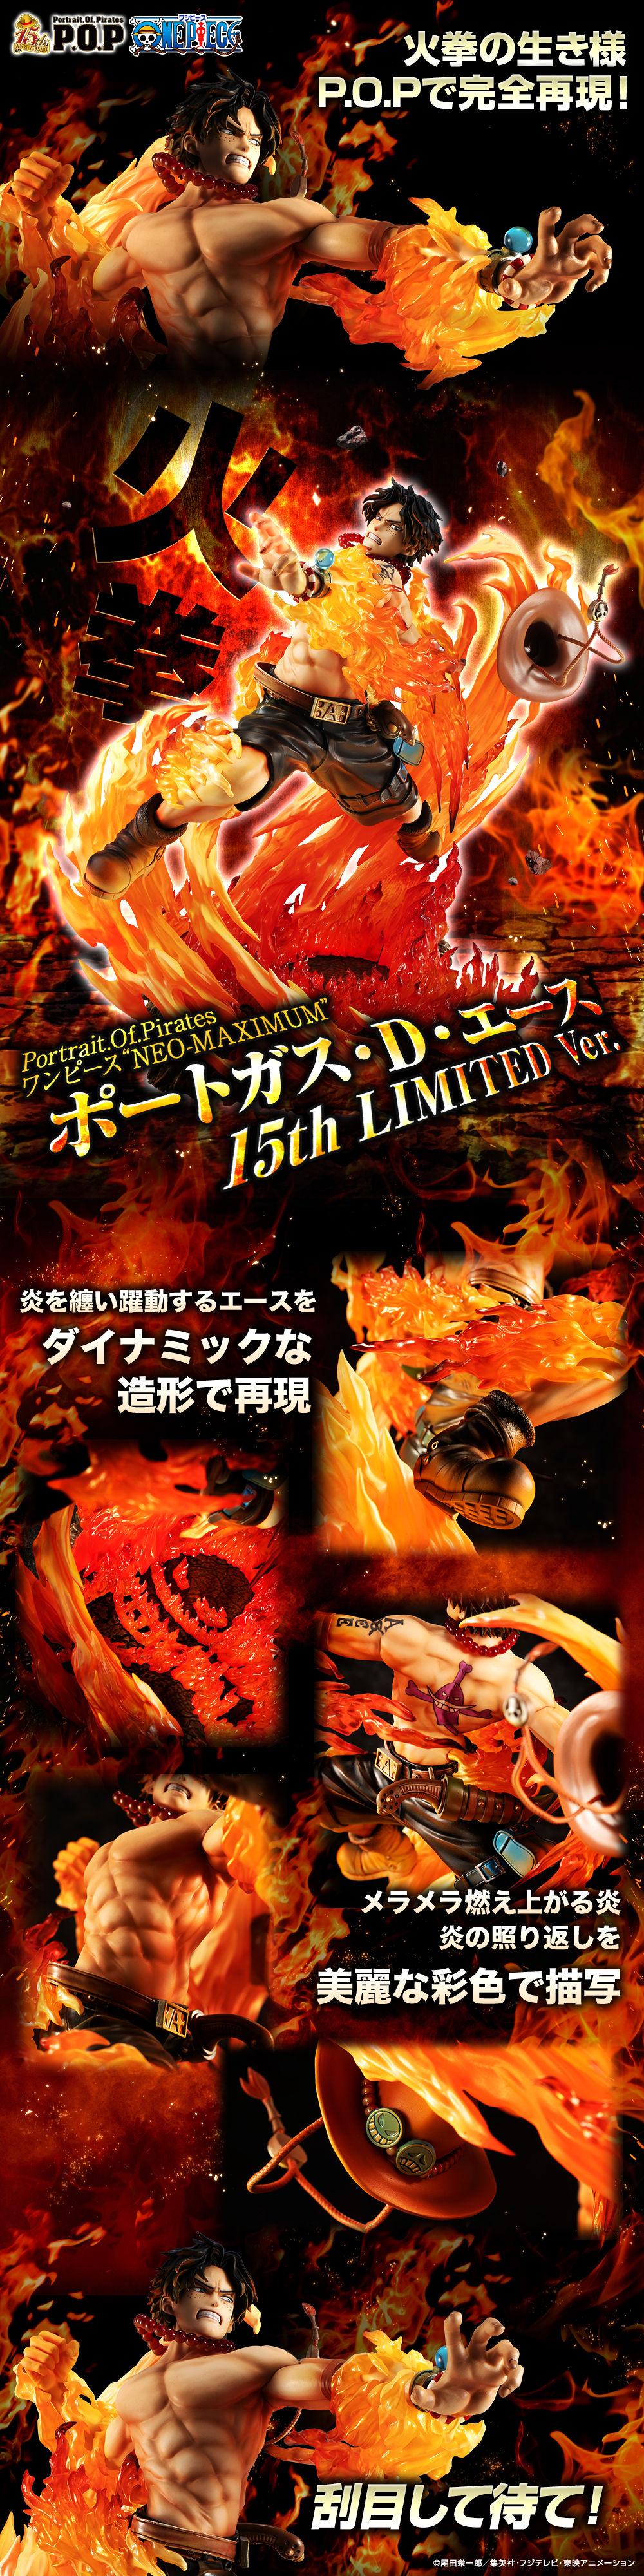 "Portrait.Of.Pirates系列""NEO-MAXIMUM"" 火拳「波特卡斯·D·艾斯 15週年限定版本」魄力登場!!ポートガス・D・エース 15th LIMITED Ver."